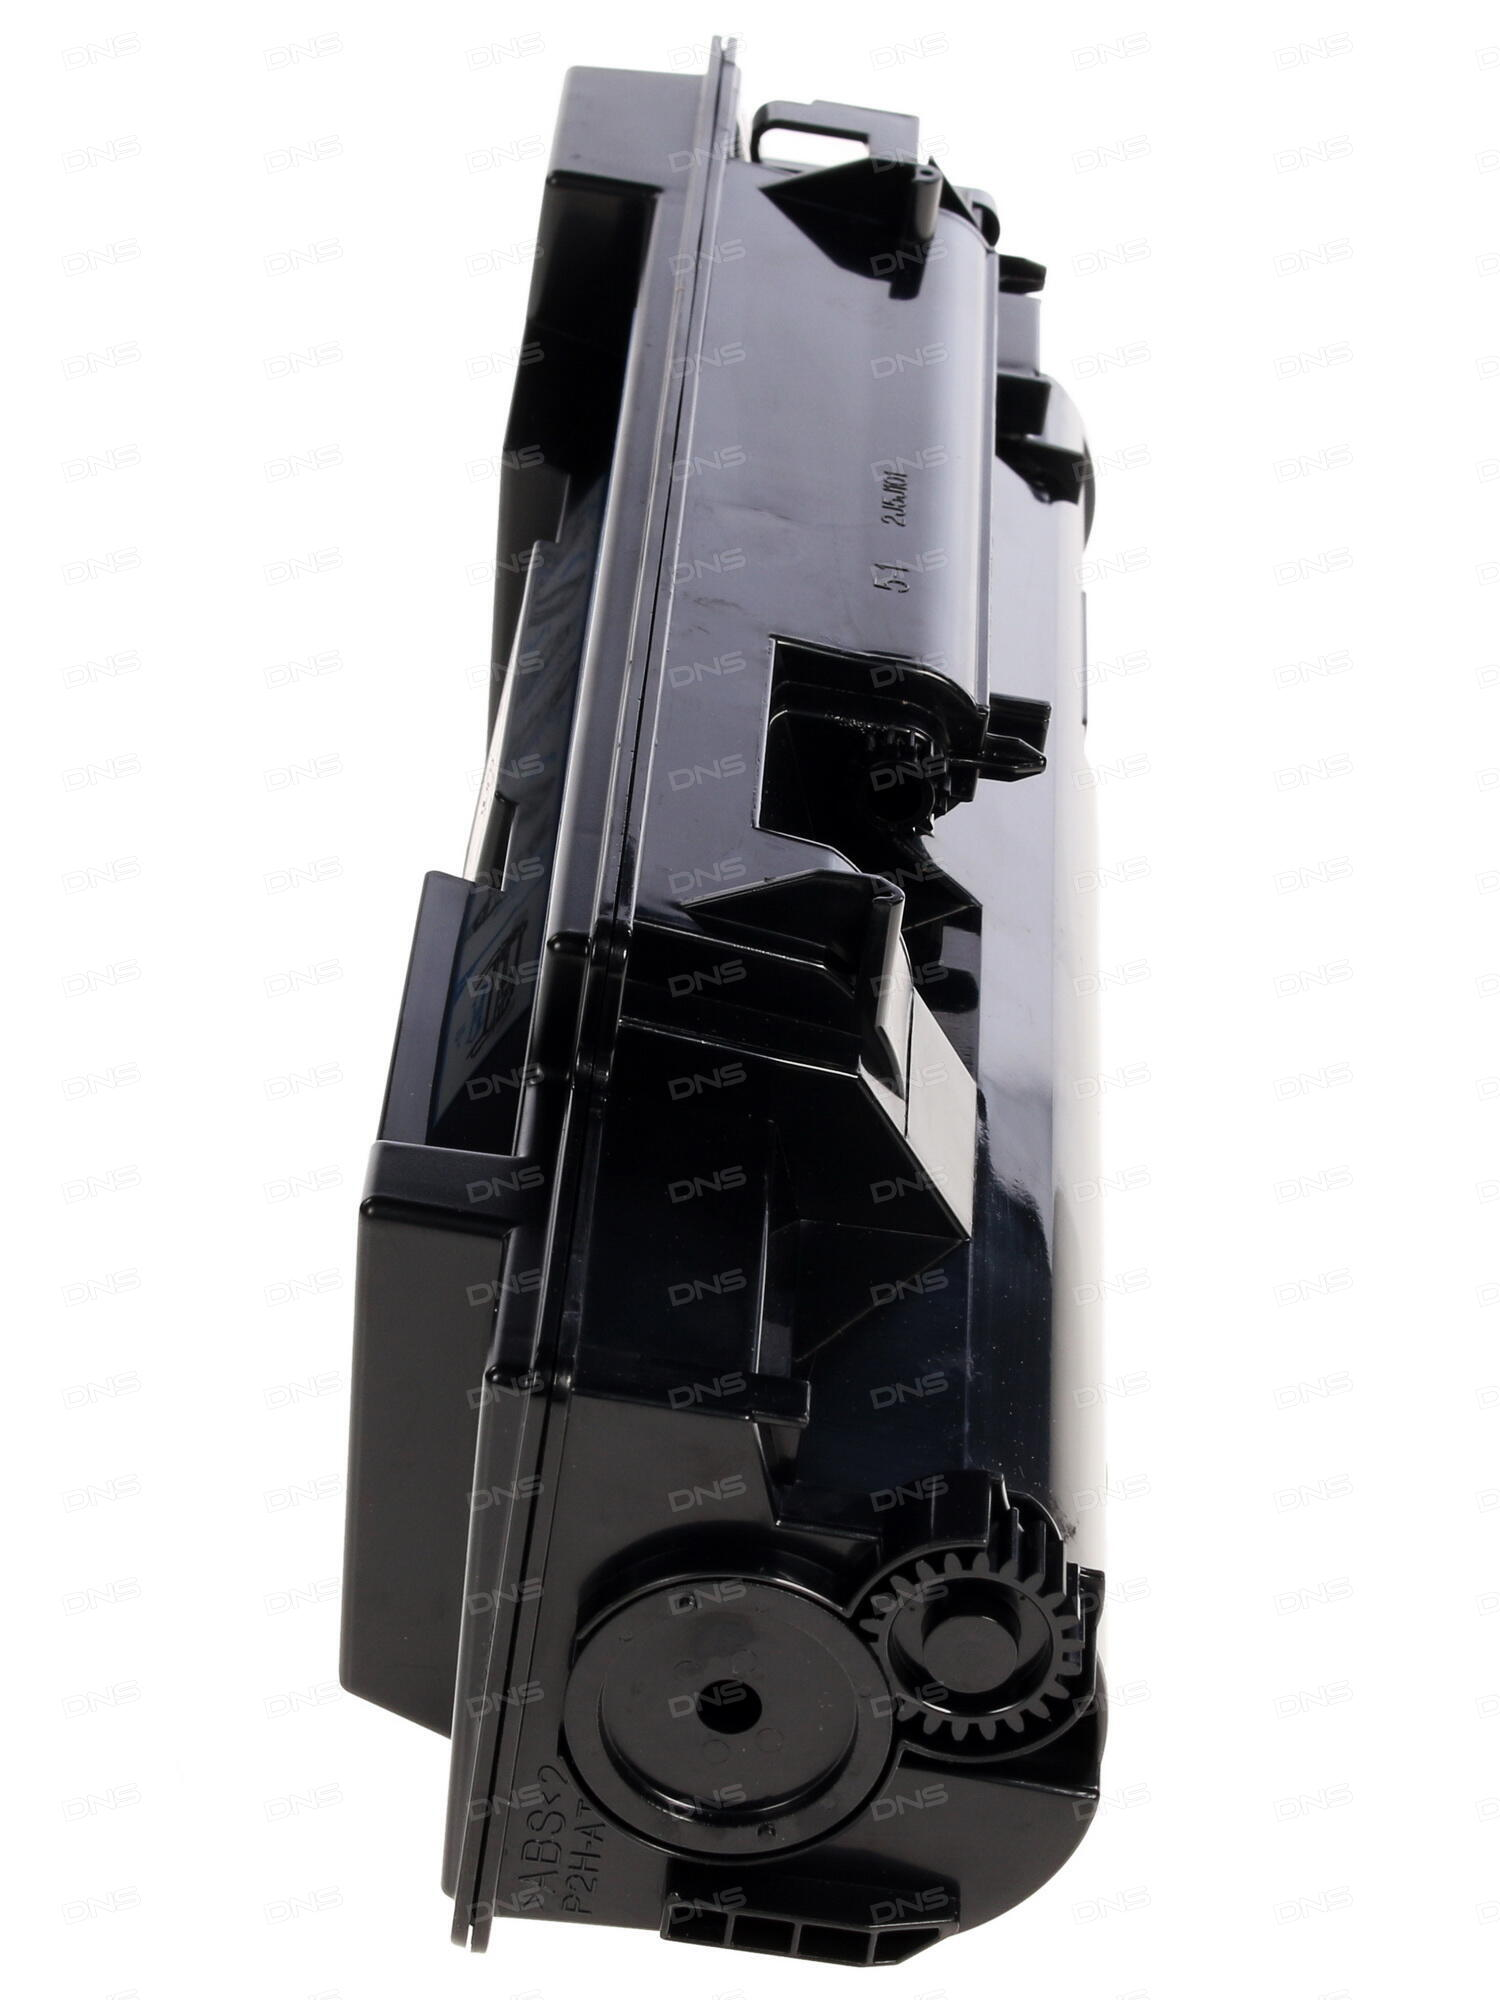 Картридж Cactus CS-EPT0481 для Epson R200 R220 R300 R320 черный